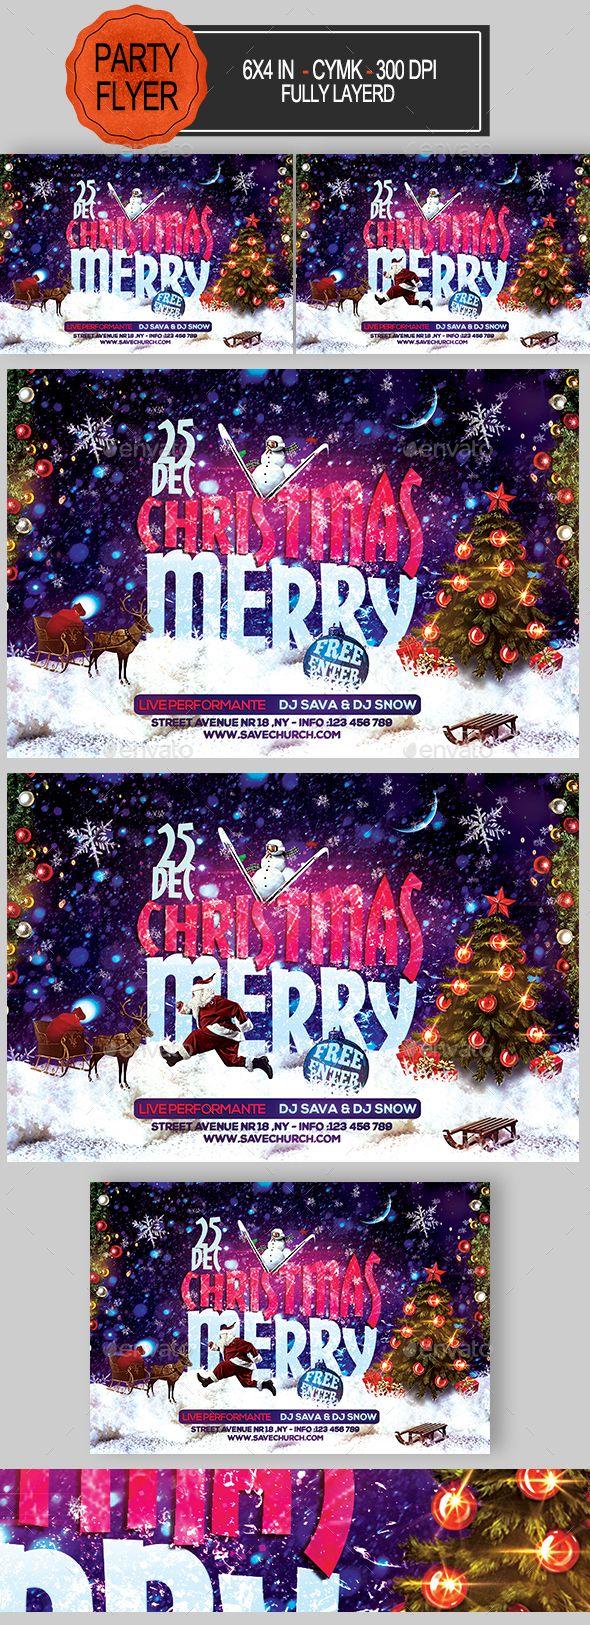 The 169 Best Christmas Images On Pinterest Design Web